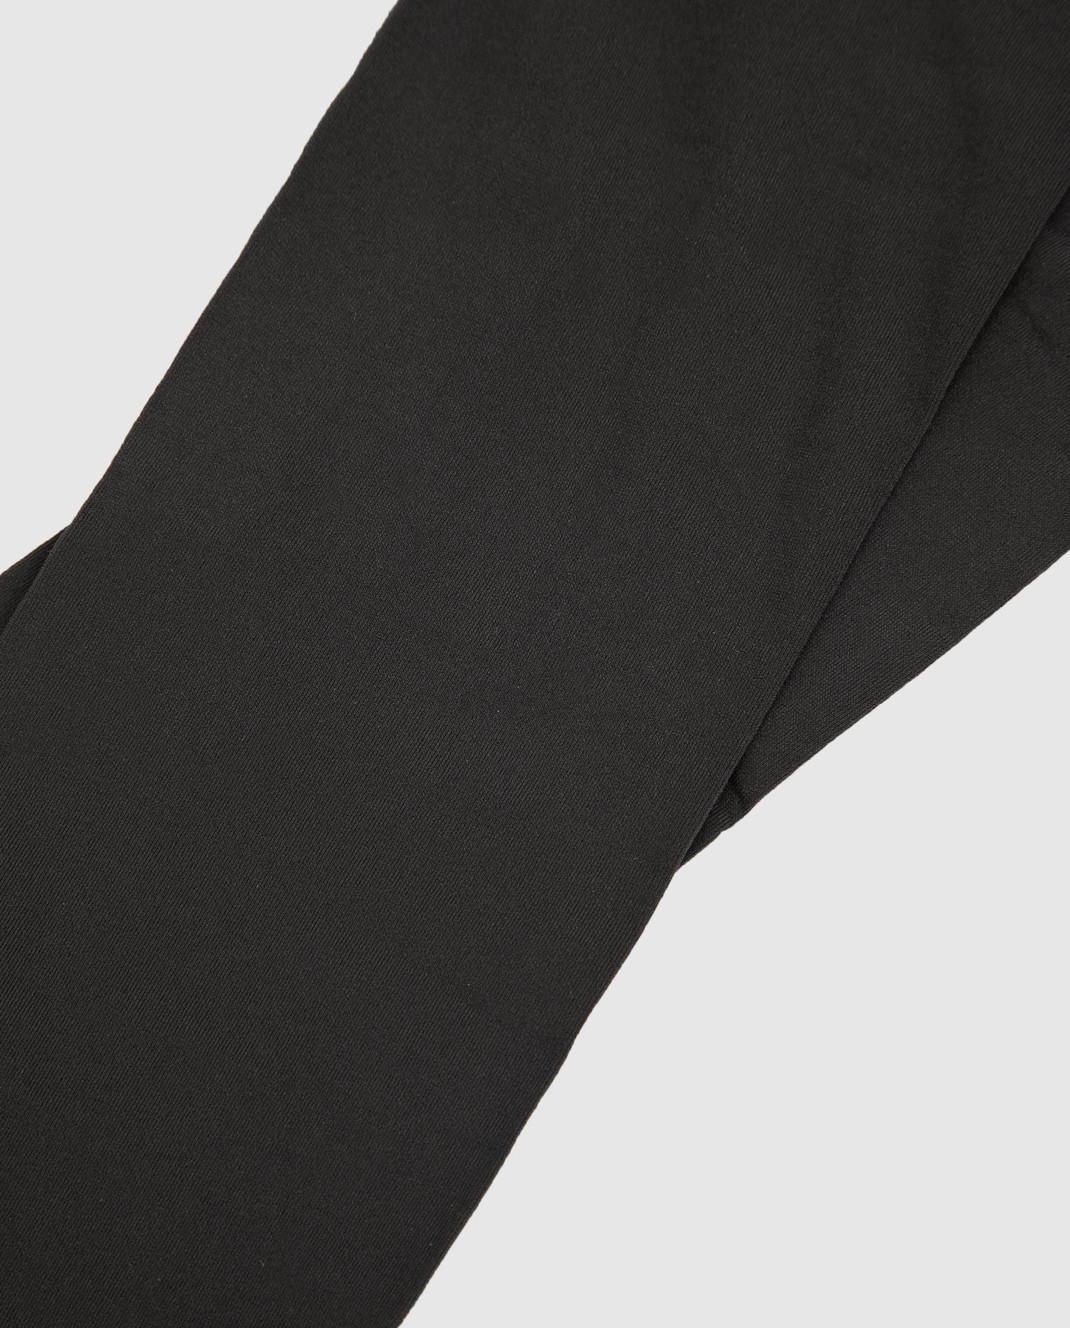 Max Mara Темно-серые колготы 30 ден изображение 3